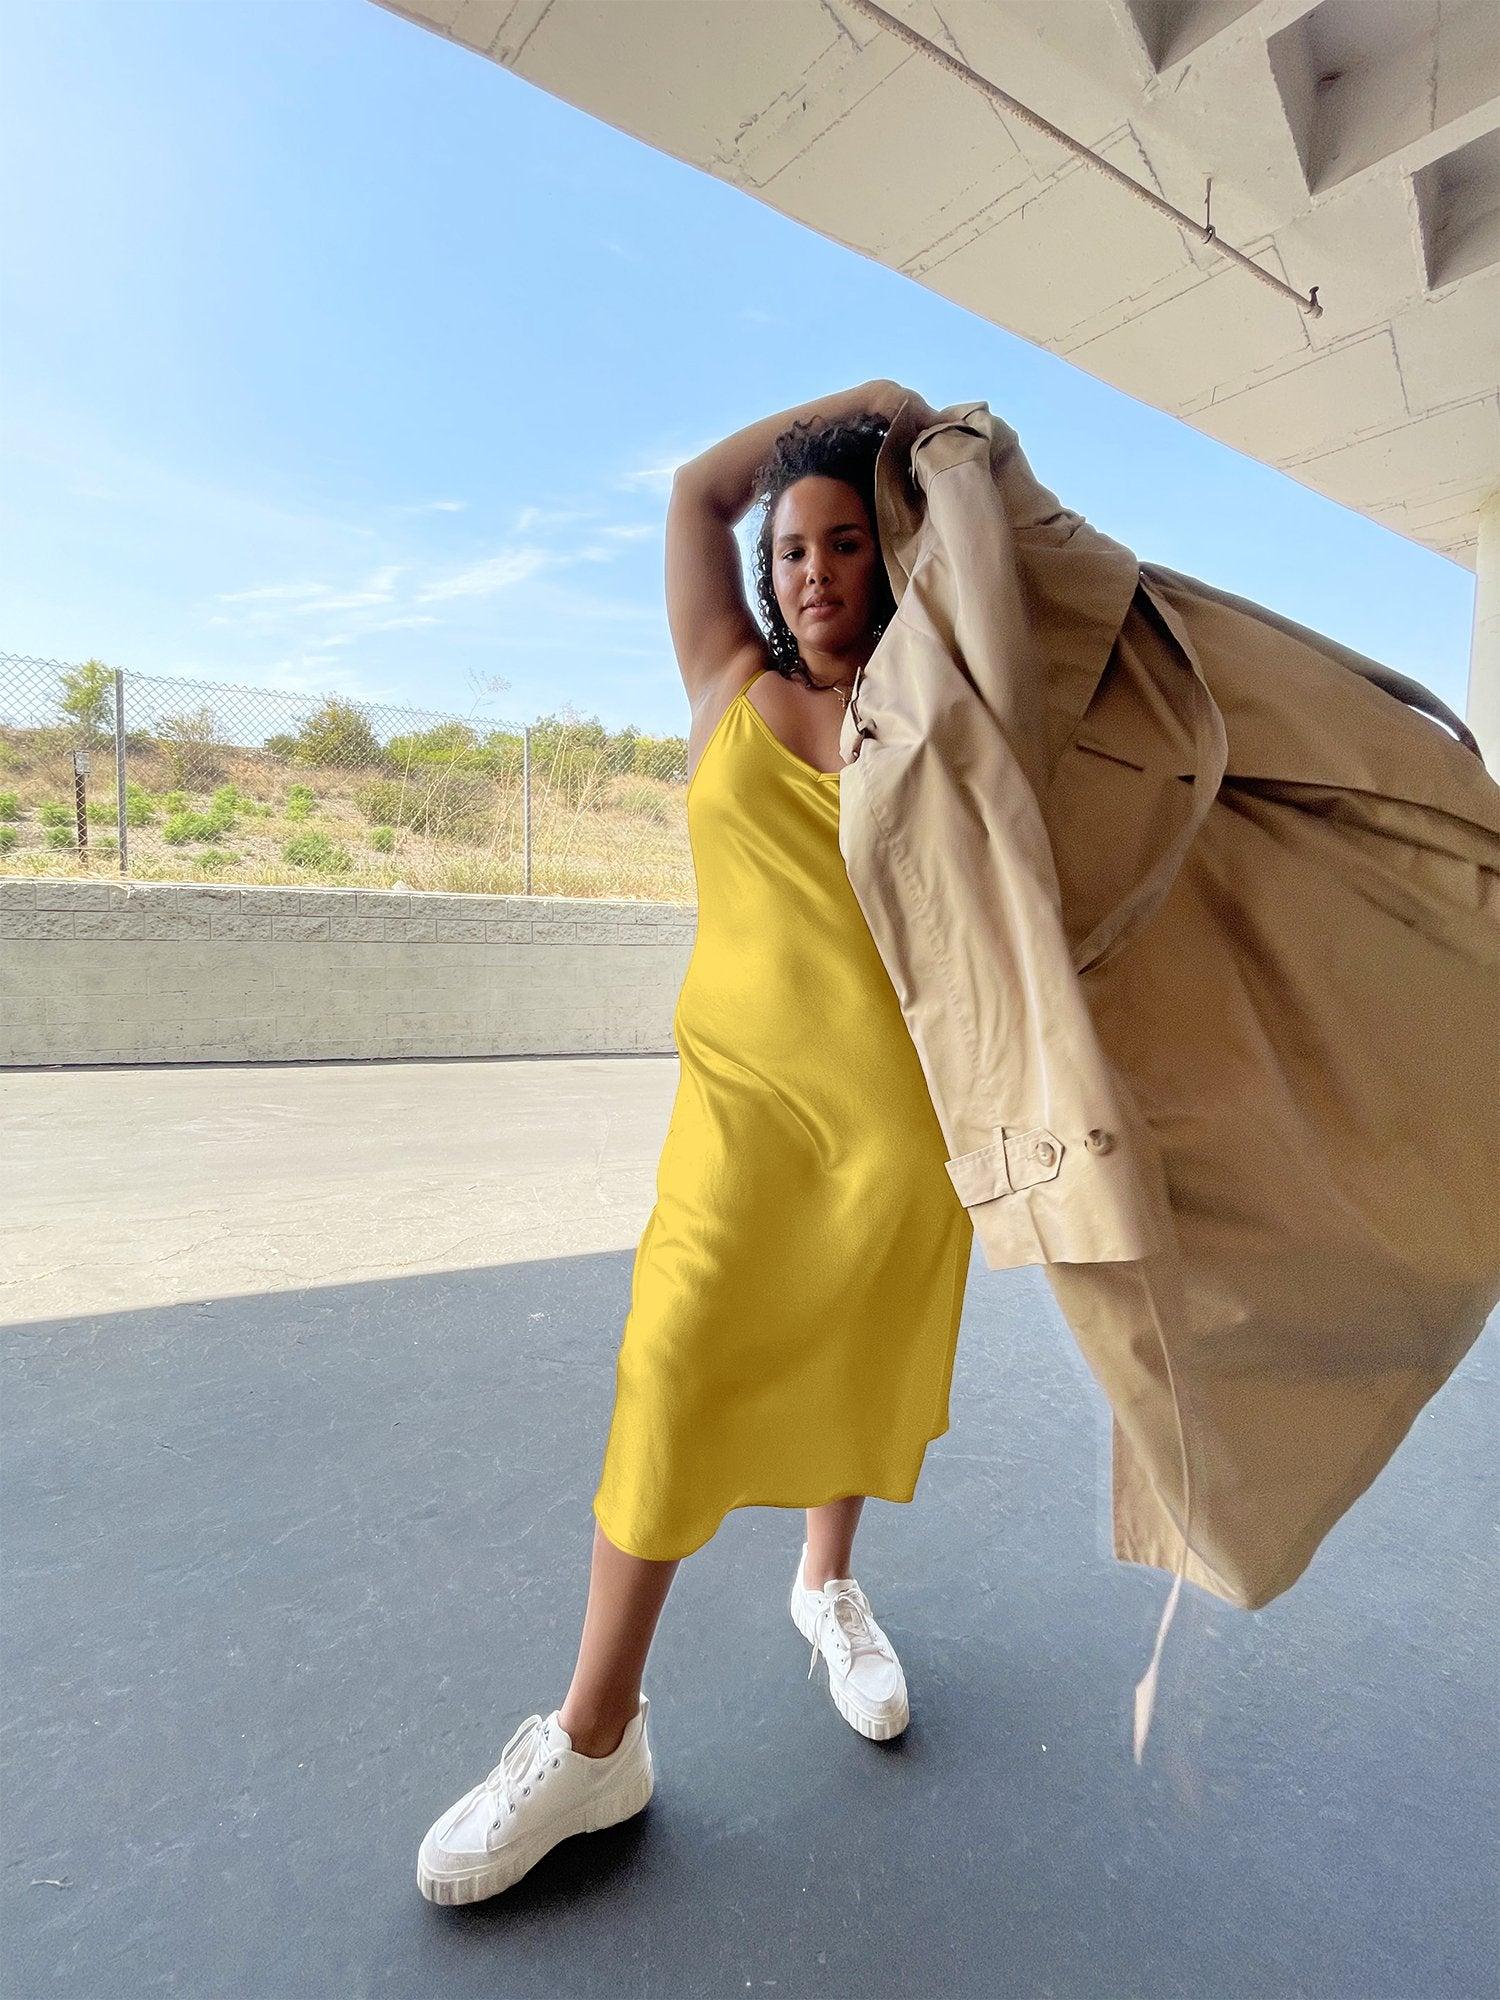 model wearing yellow slip dress